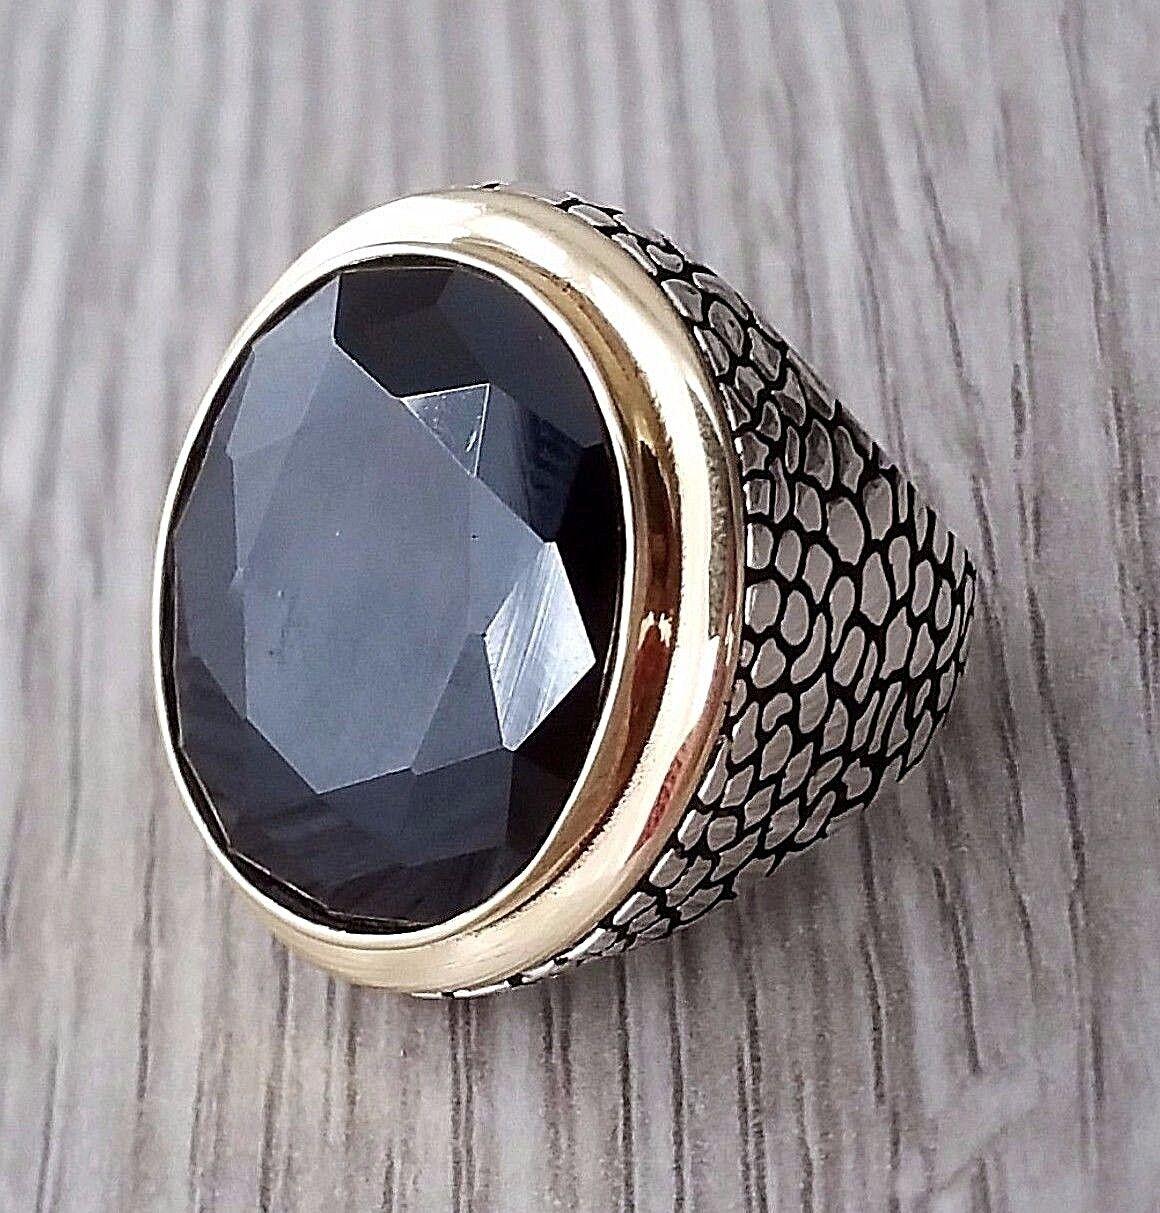 Turco otomano Negro Onyx piedras preciosas sólido 925 plata esterlina MENS anillo de piedras preciosas